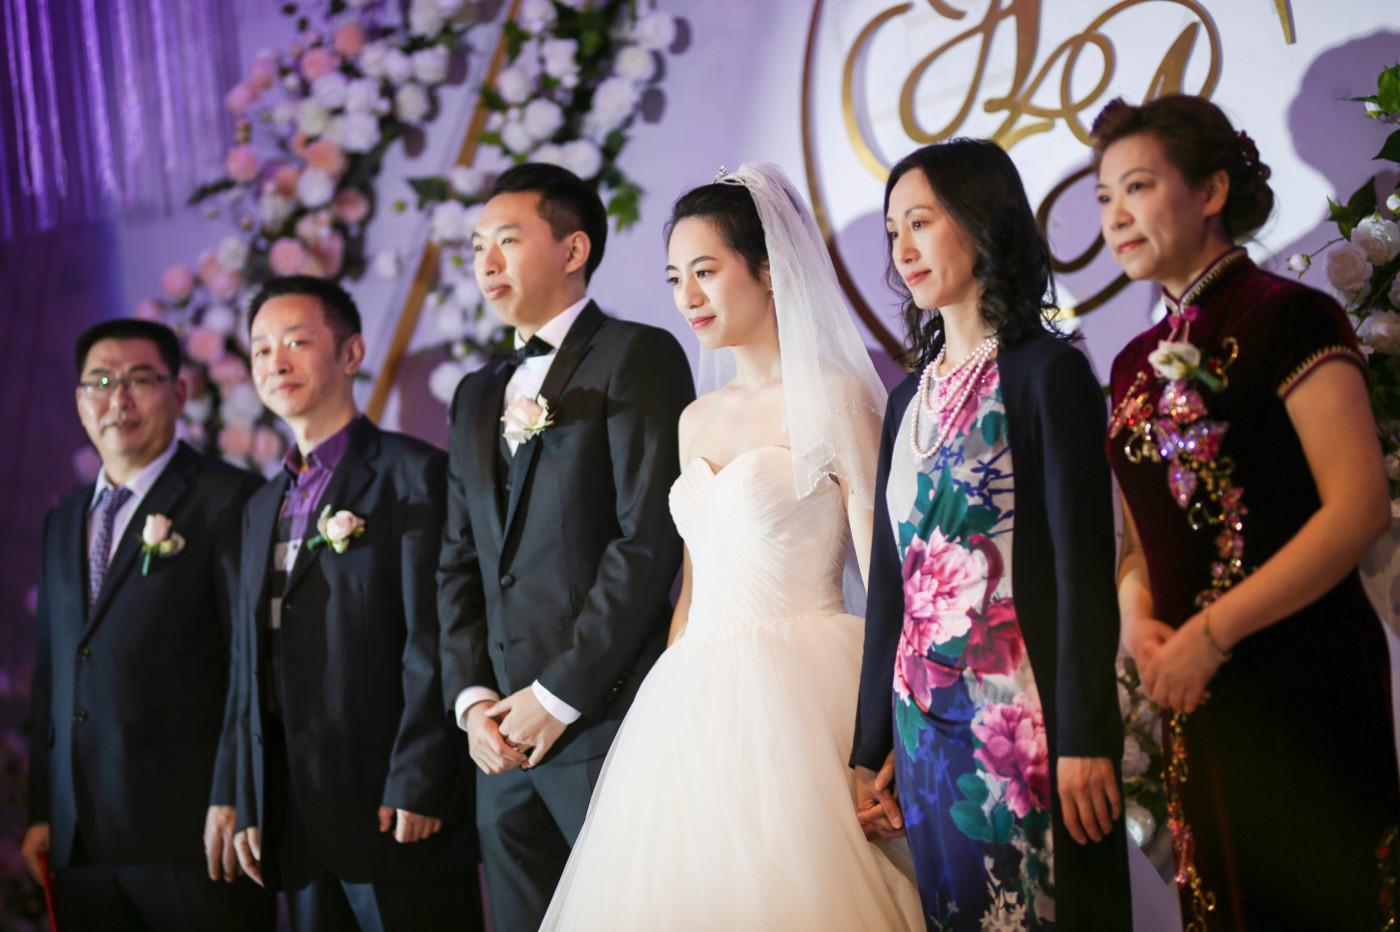 【KAI 婚礼纪实】Z&Y 常州婚礼35